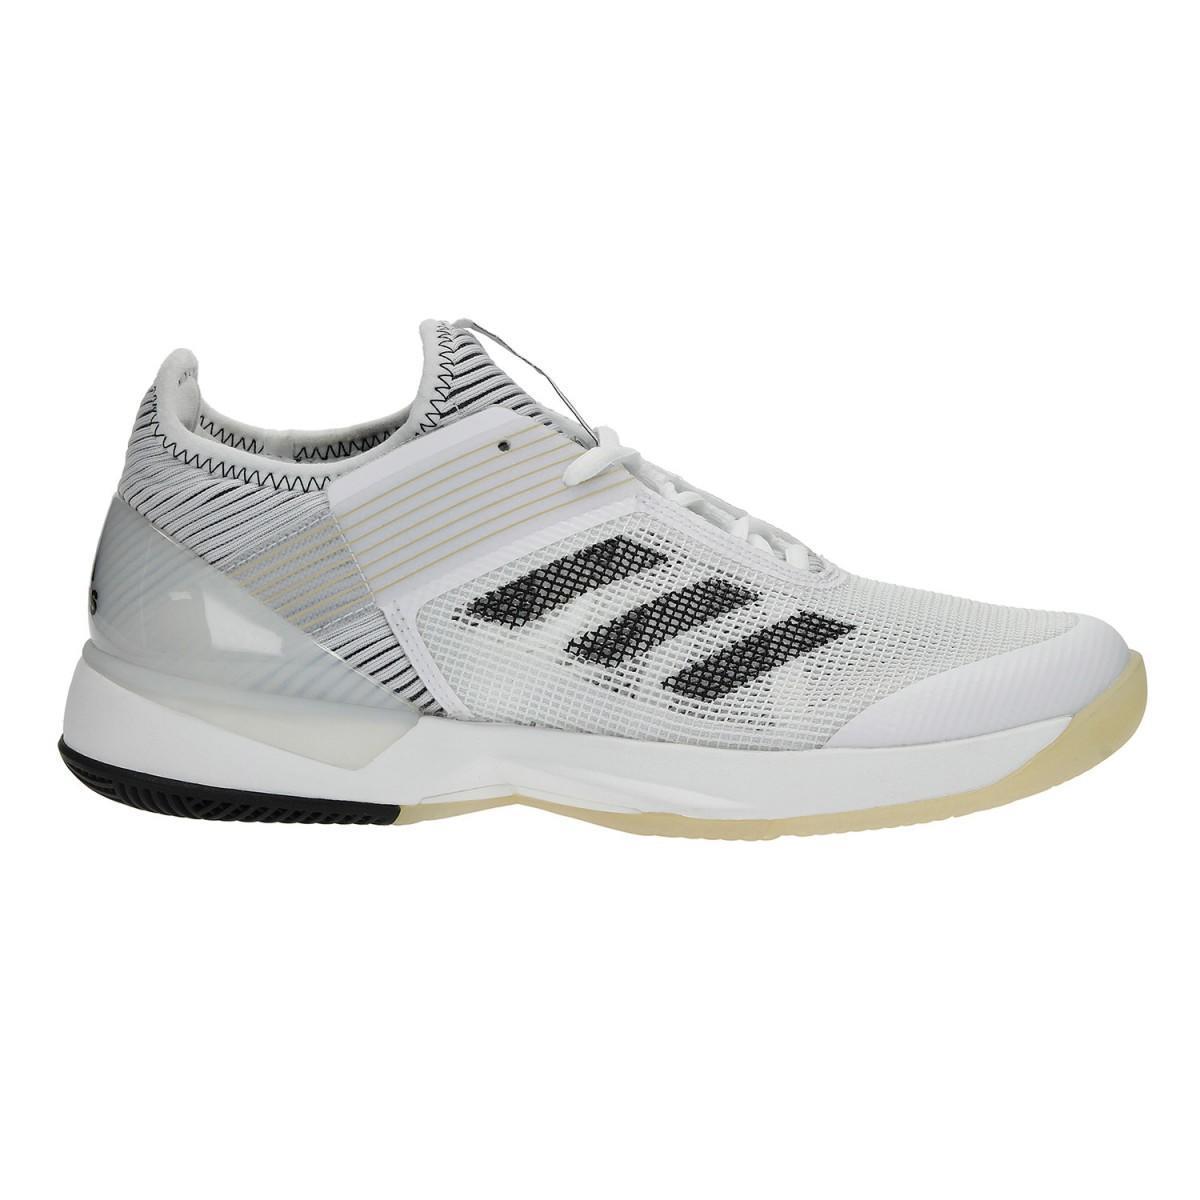 Теннисные кроссовки женские Adidas Adizero Ubersonic 3 W white/black